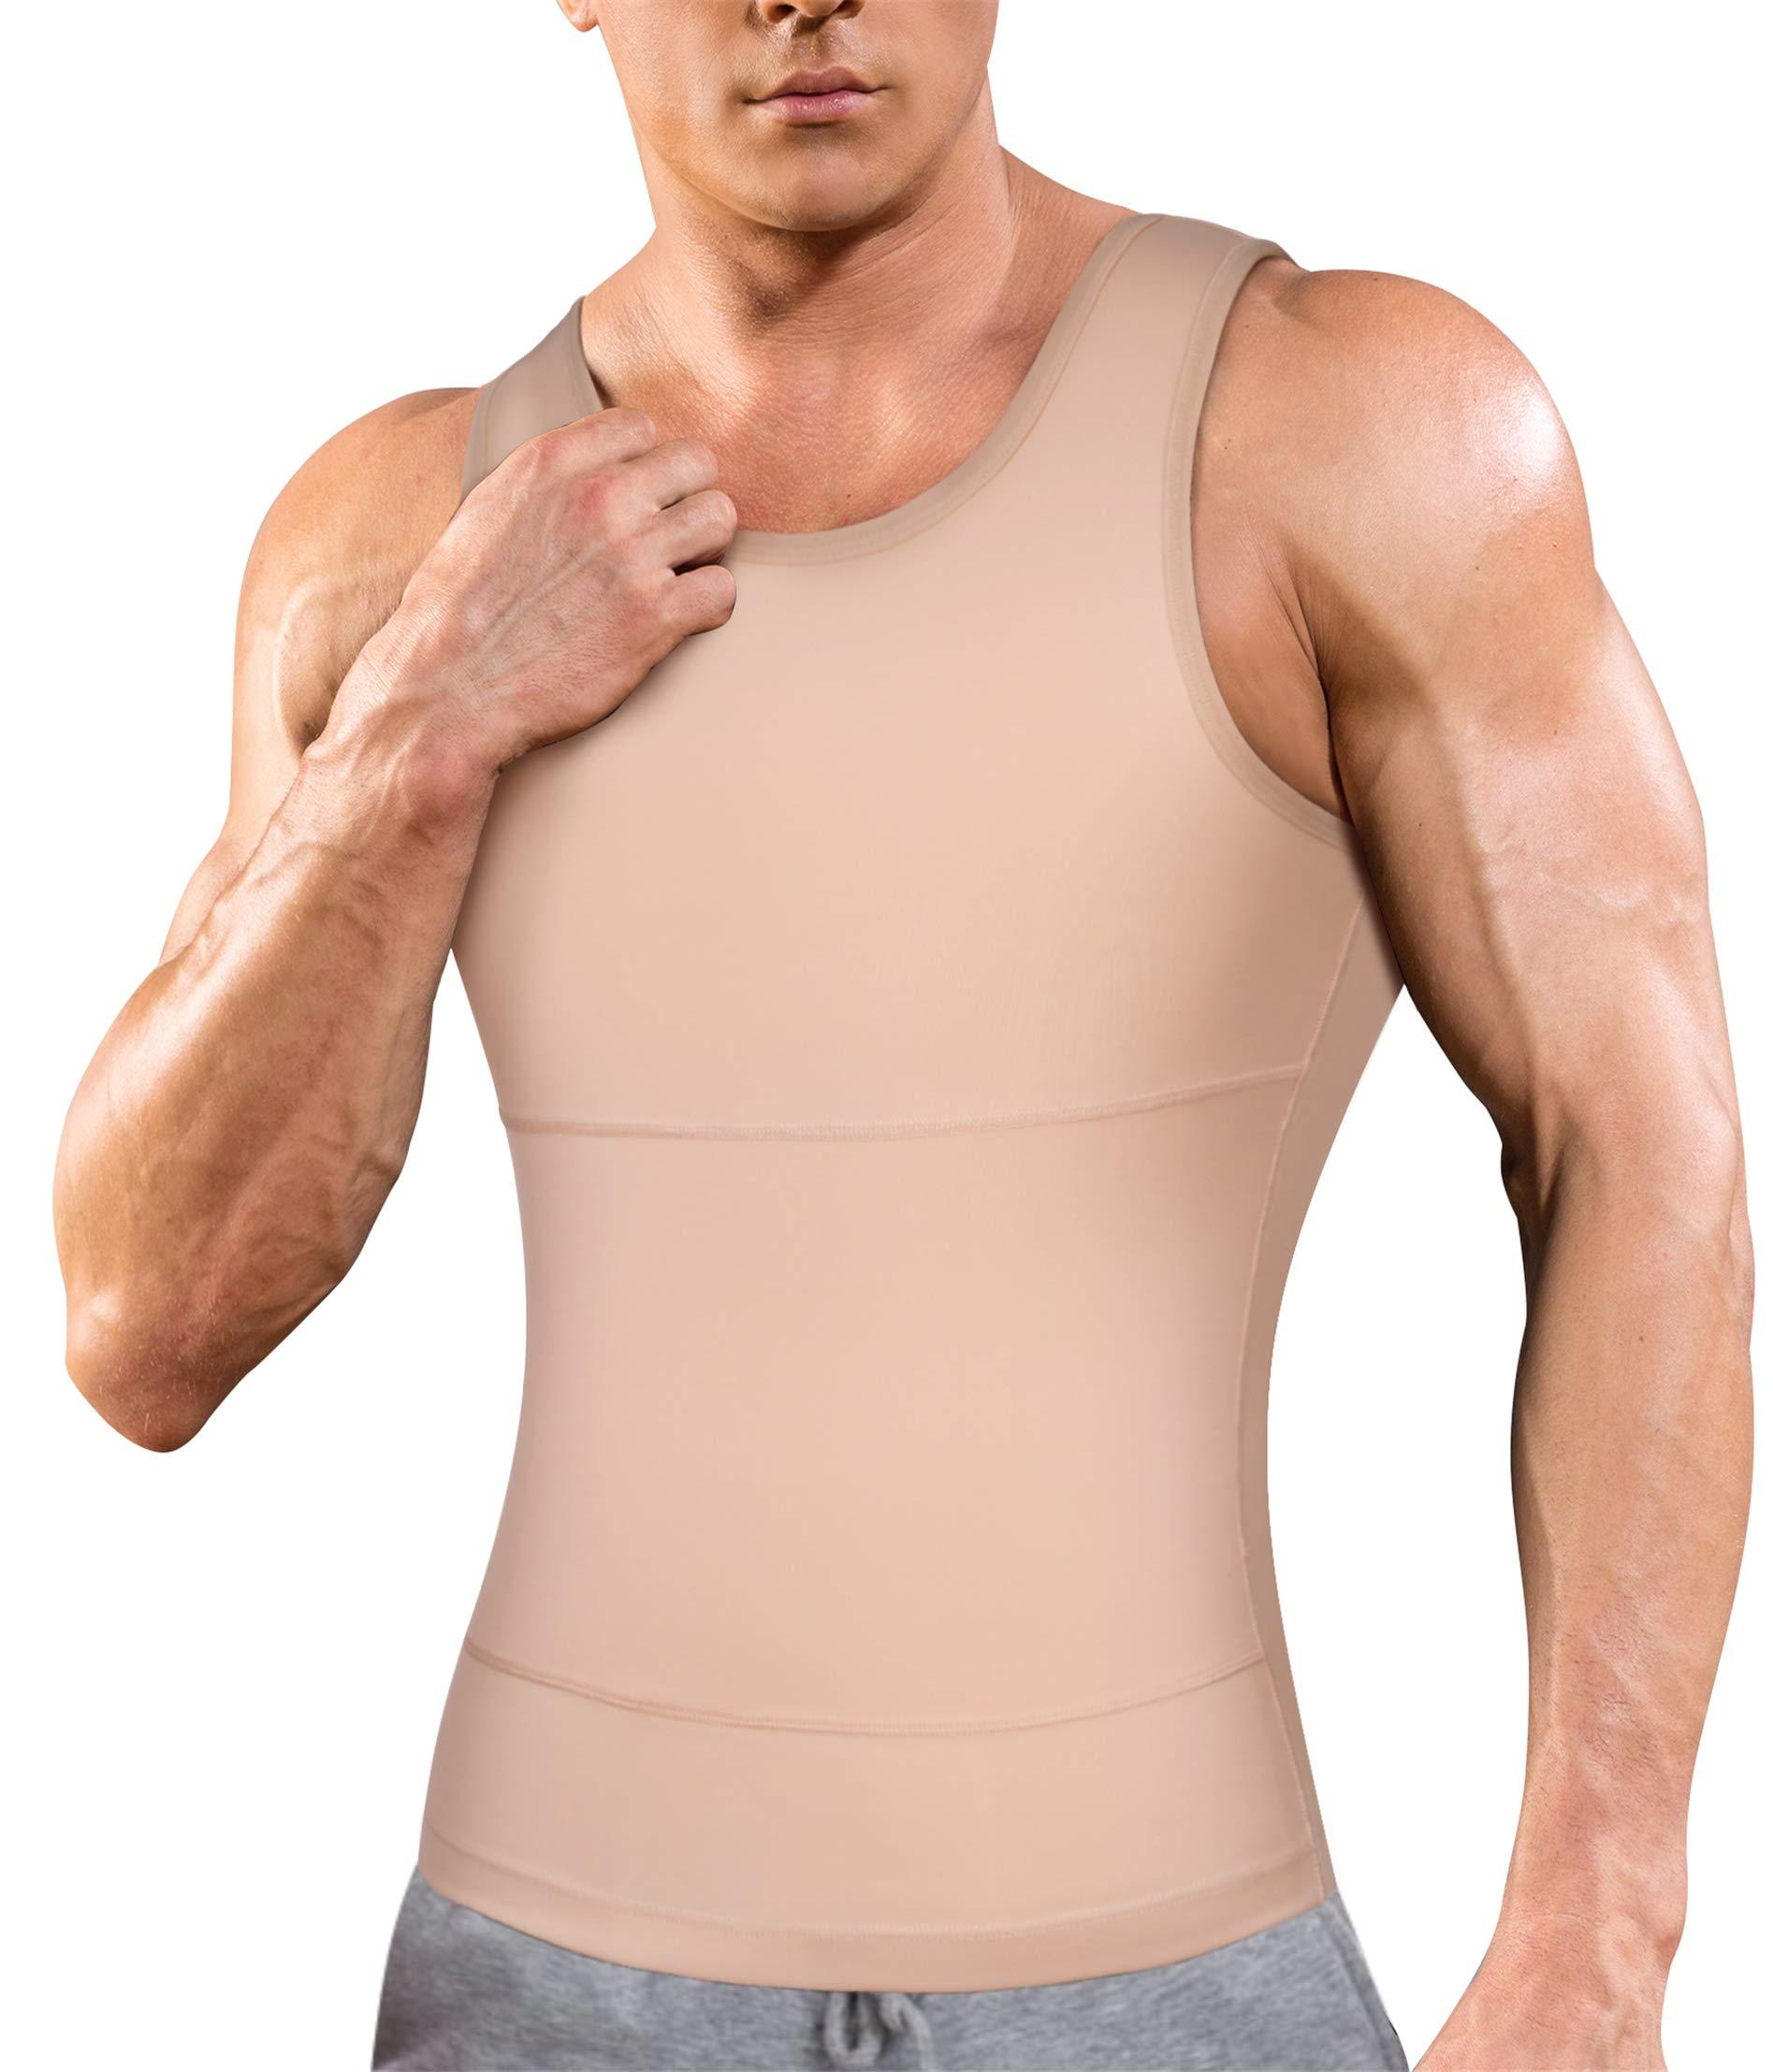 Mens Compression Shirt Slimming Body Shaper Vest Workout Tank Tops Abs Abdomen Undershirts (Beige, S)